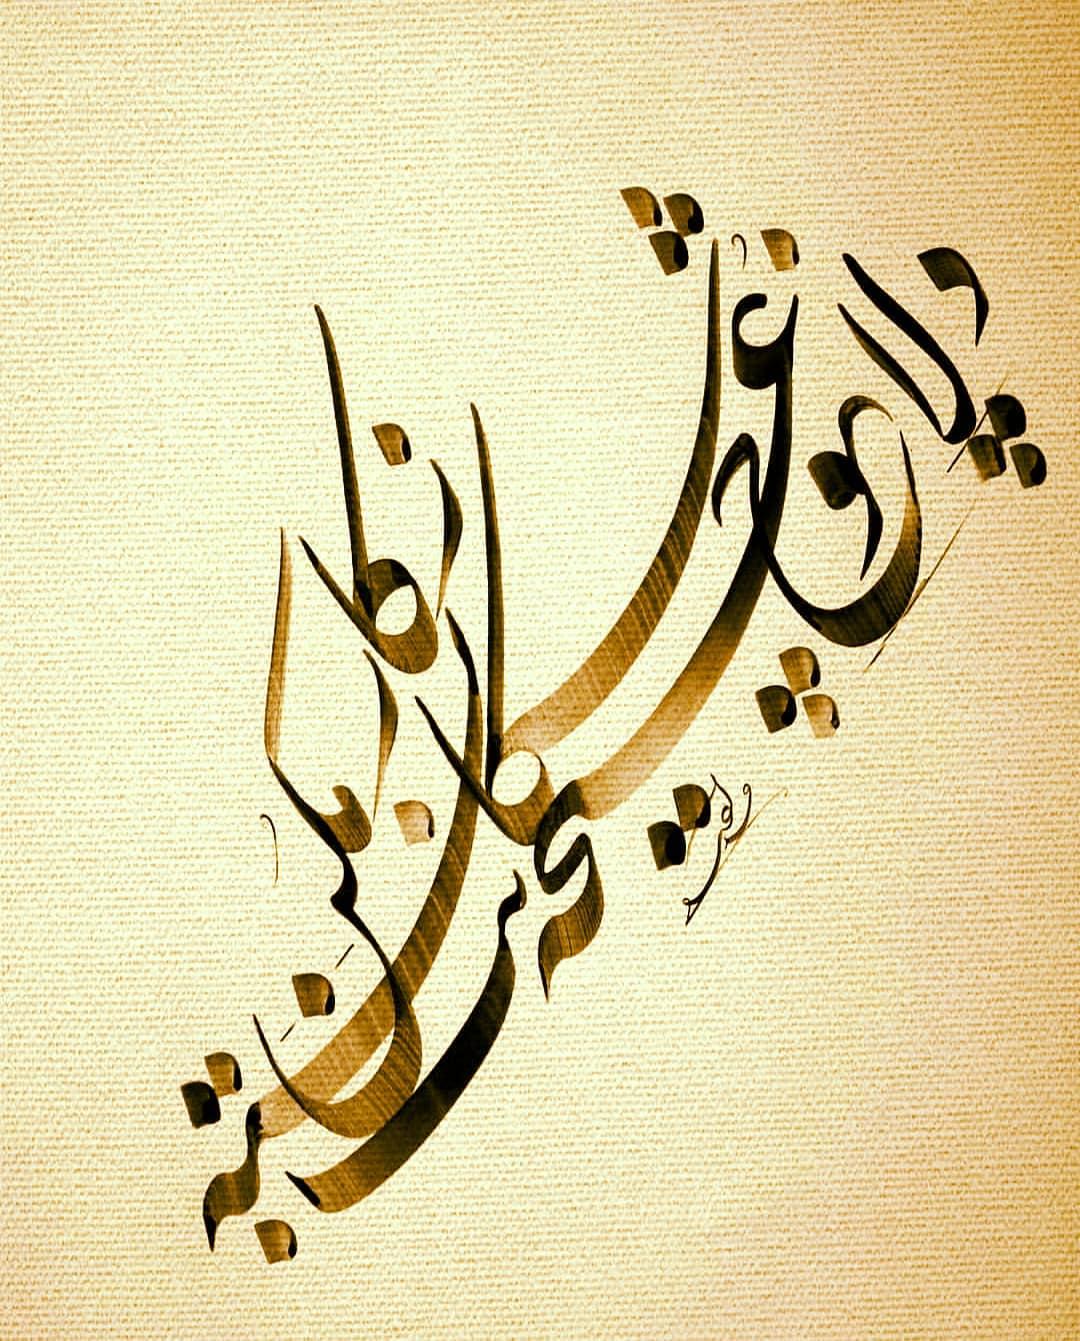 Farisi/Nasta'liq khatestan  ﷽ دلا چو غنچه شکایت ز کار بسته مکن . #خطستان  @khatestan #خط_خودکاری#خط_خودکاری... 1194 1